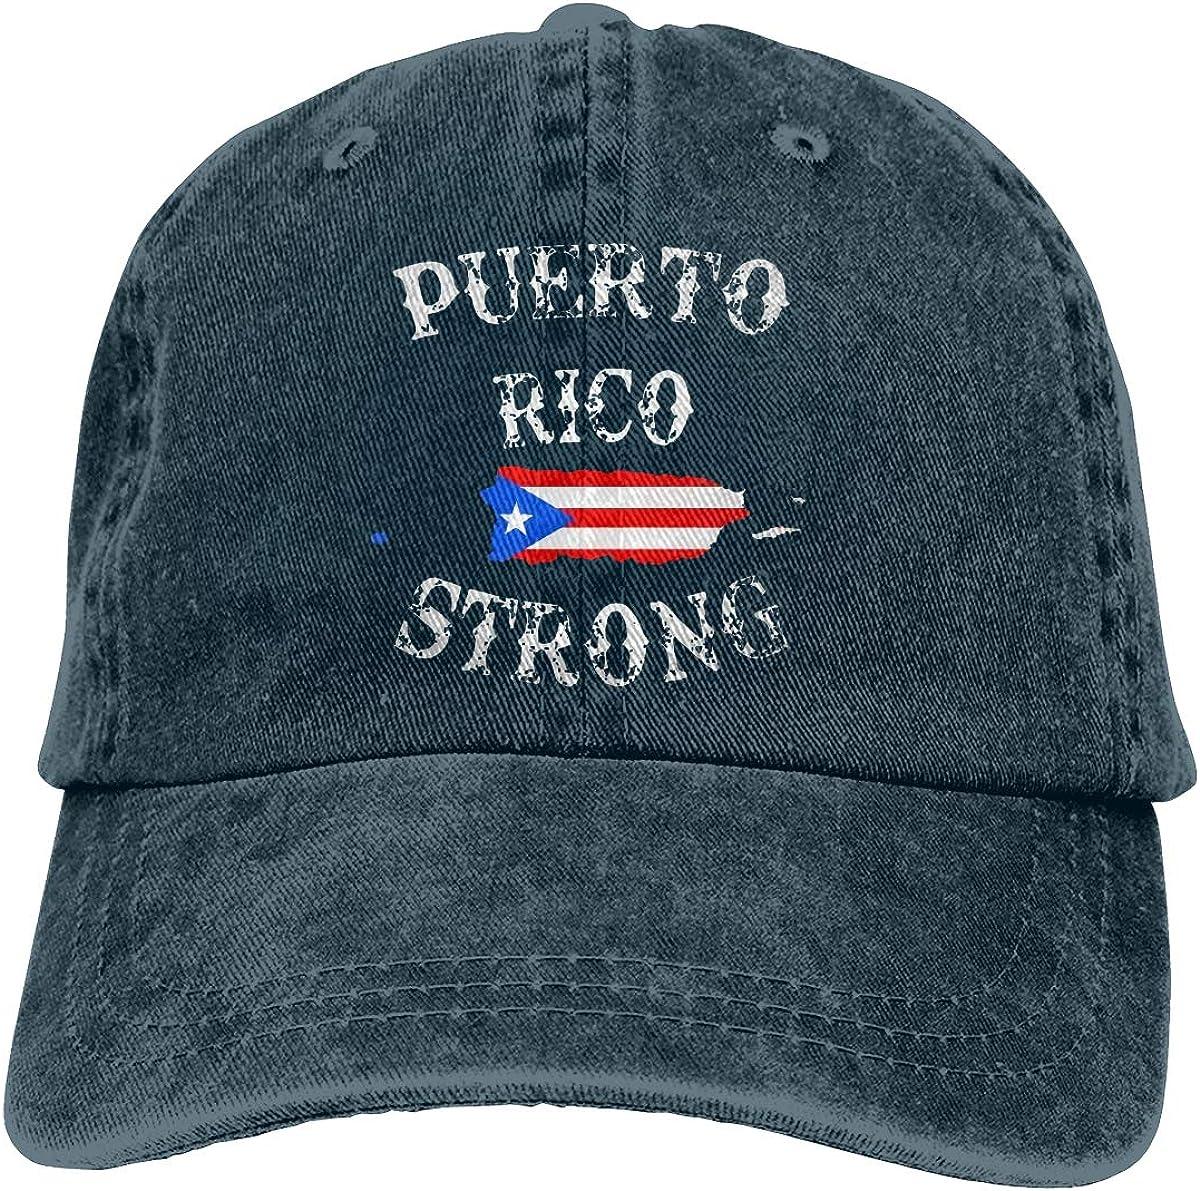 YISHOW Unisex Puerto Rico Strong Yarn-Dyed Denim Baseball Cap Adjustable Topee for Men Or Women